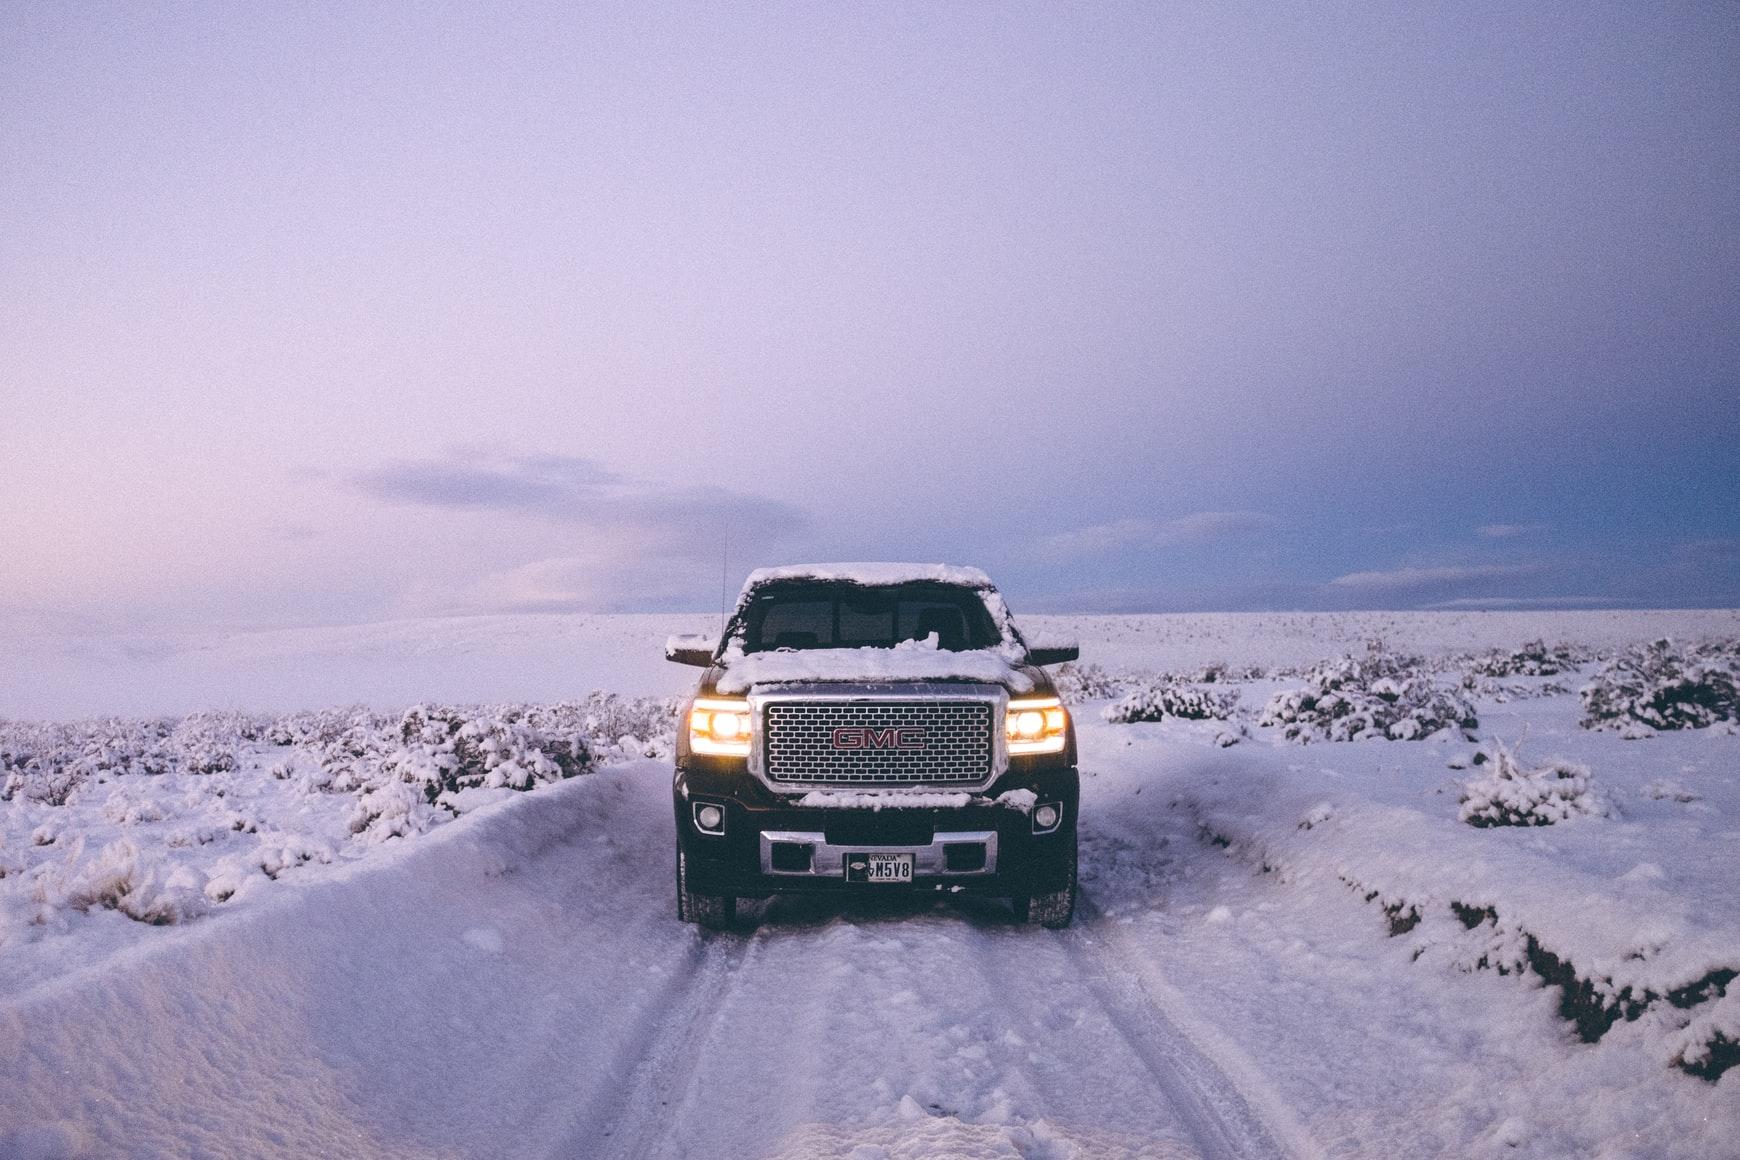 Winter Season Driving Safety and Preparedness